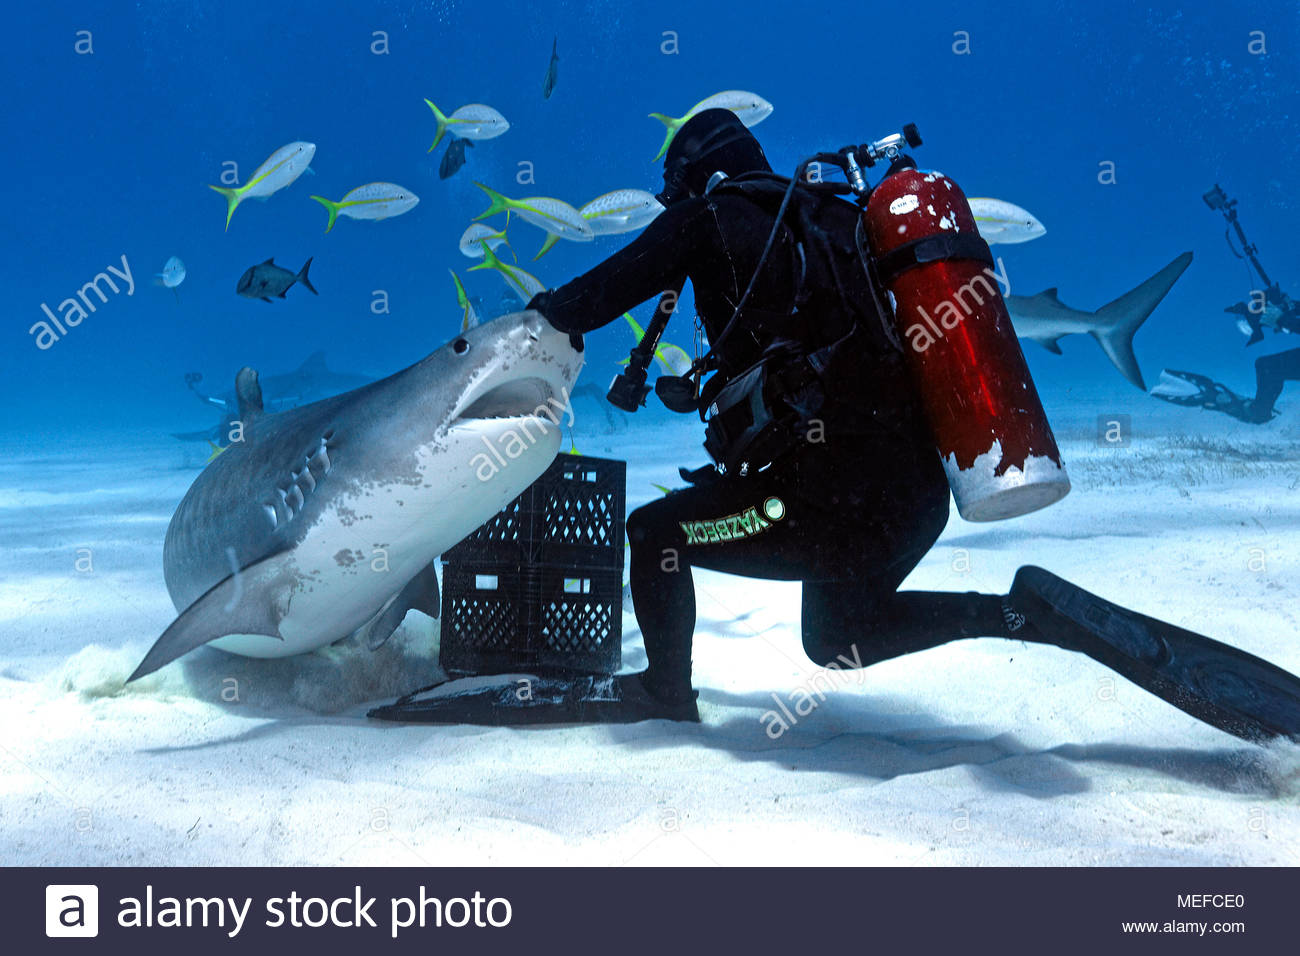 Haifütterung, Taucher füttert Tigerhai (Galeocerdo cuvier), Bahamas | Shark feeding, scuba diver feeds a Tiger shark (Galeocerdo cuvier), Bahamas - Stock Image